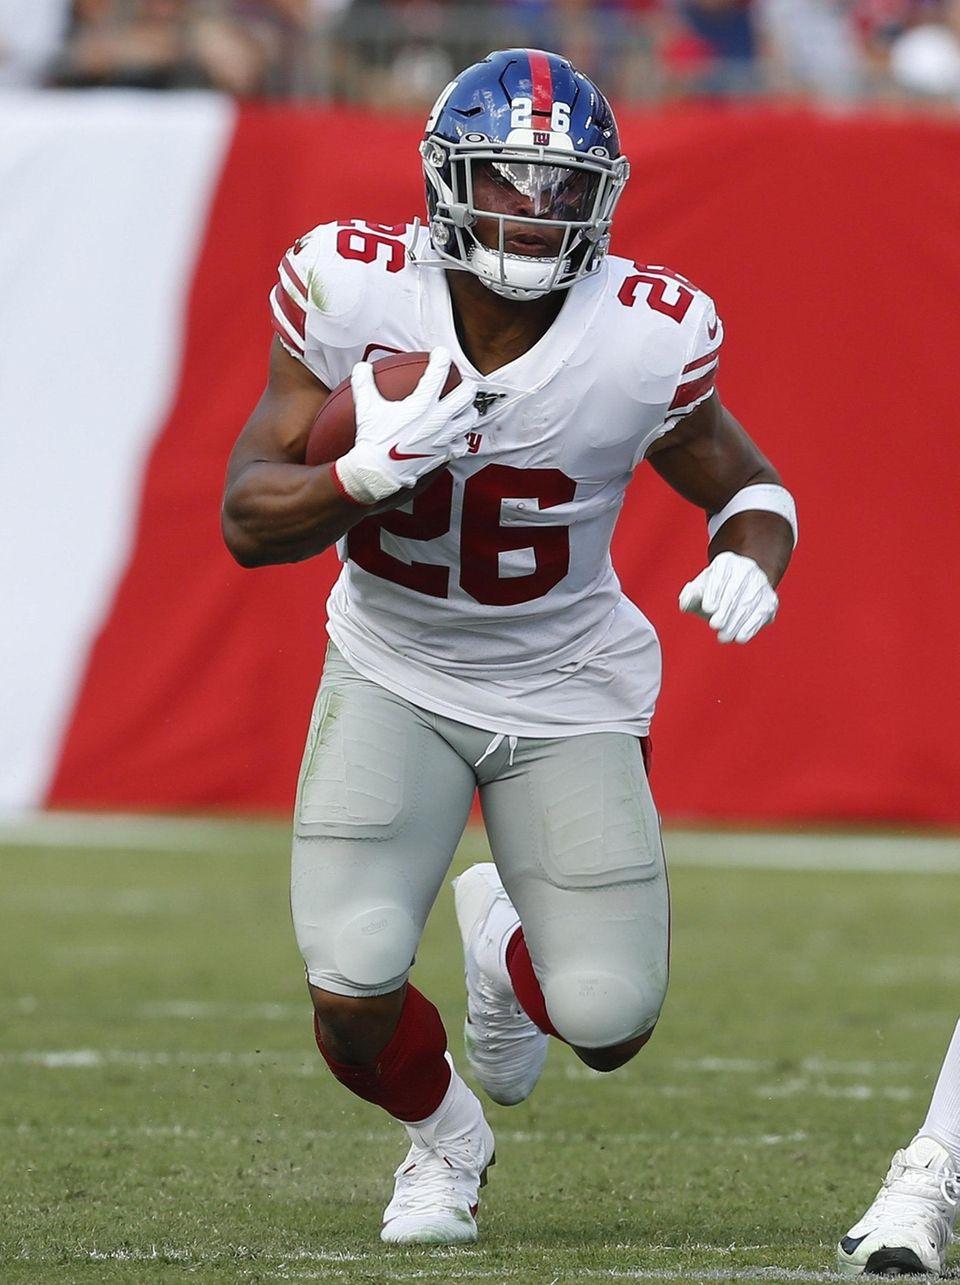 Running back Saquon Barkley of the Giants runs